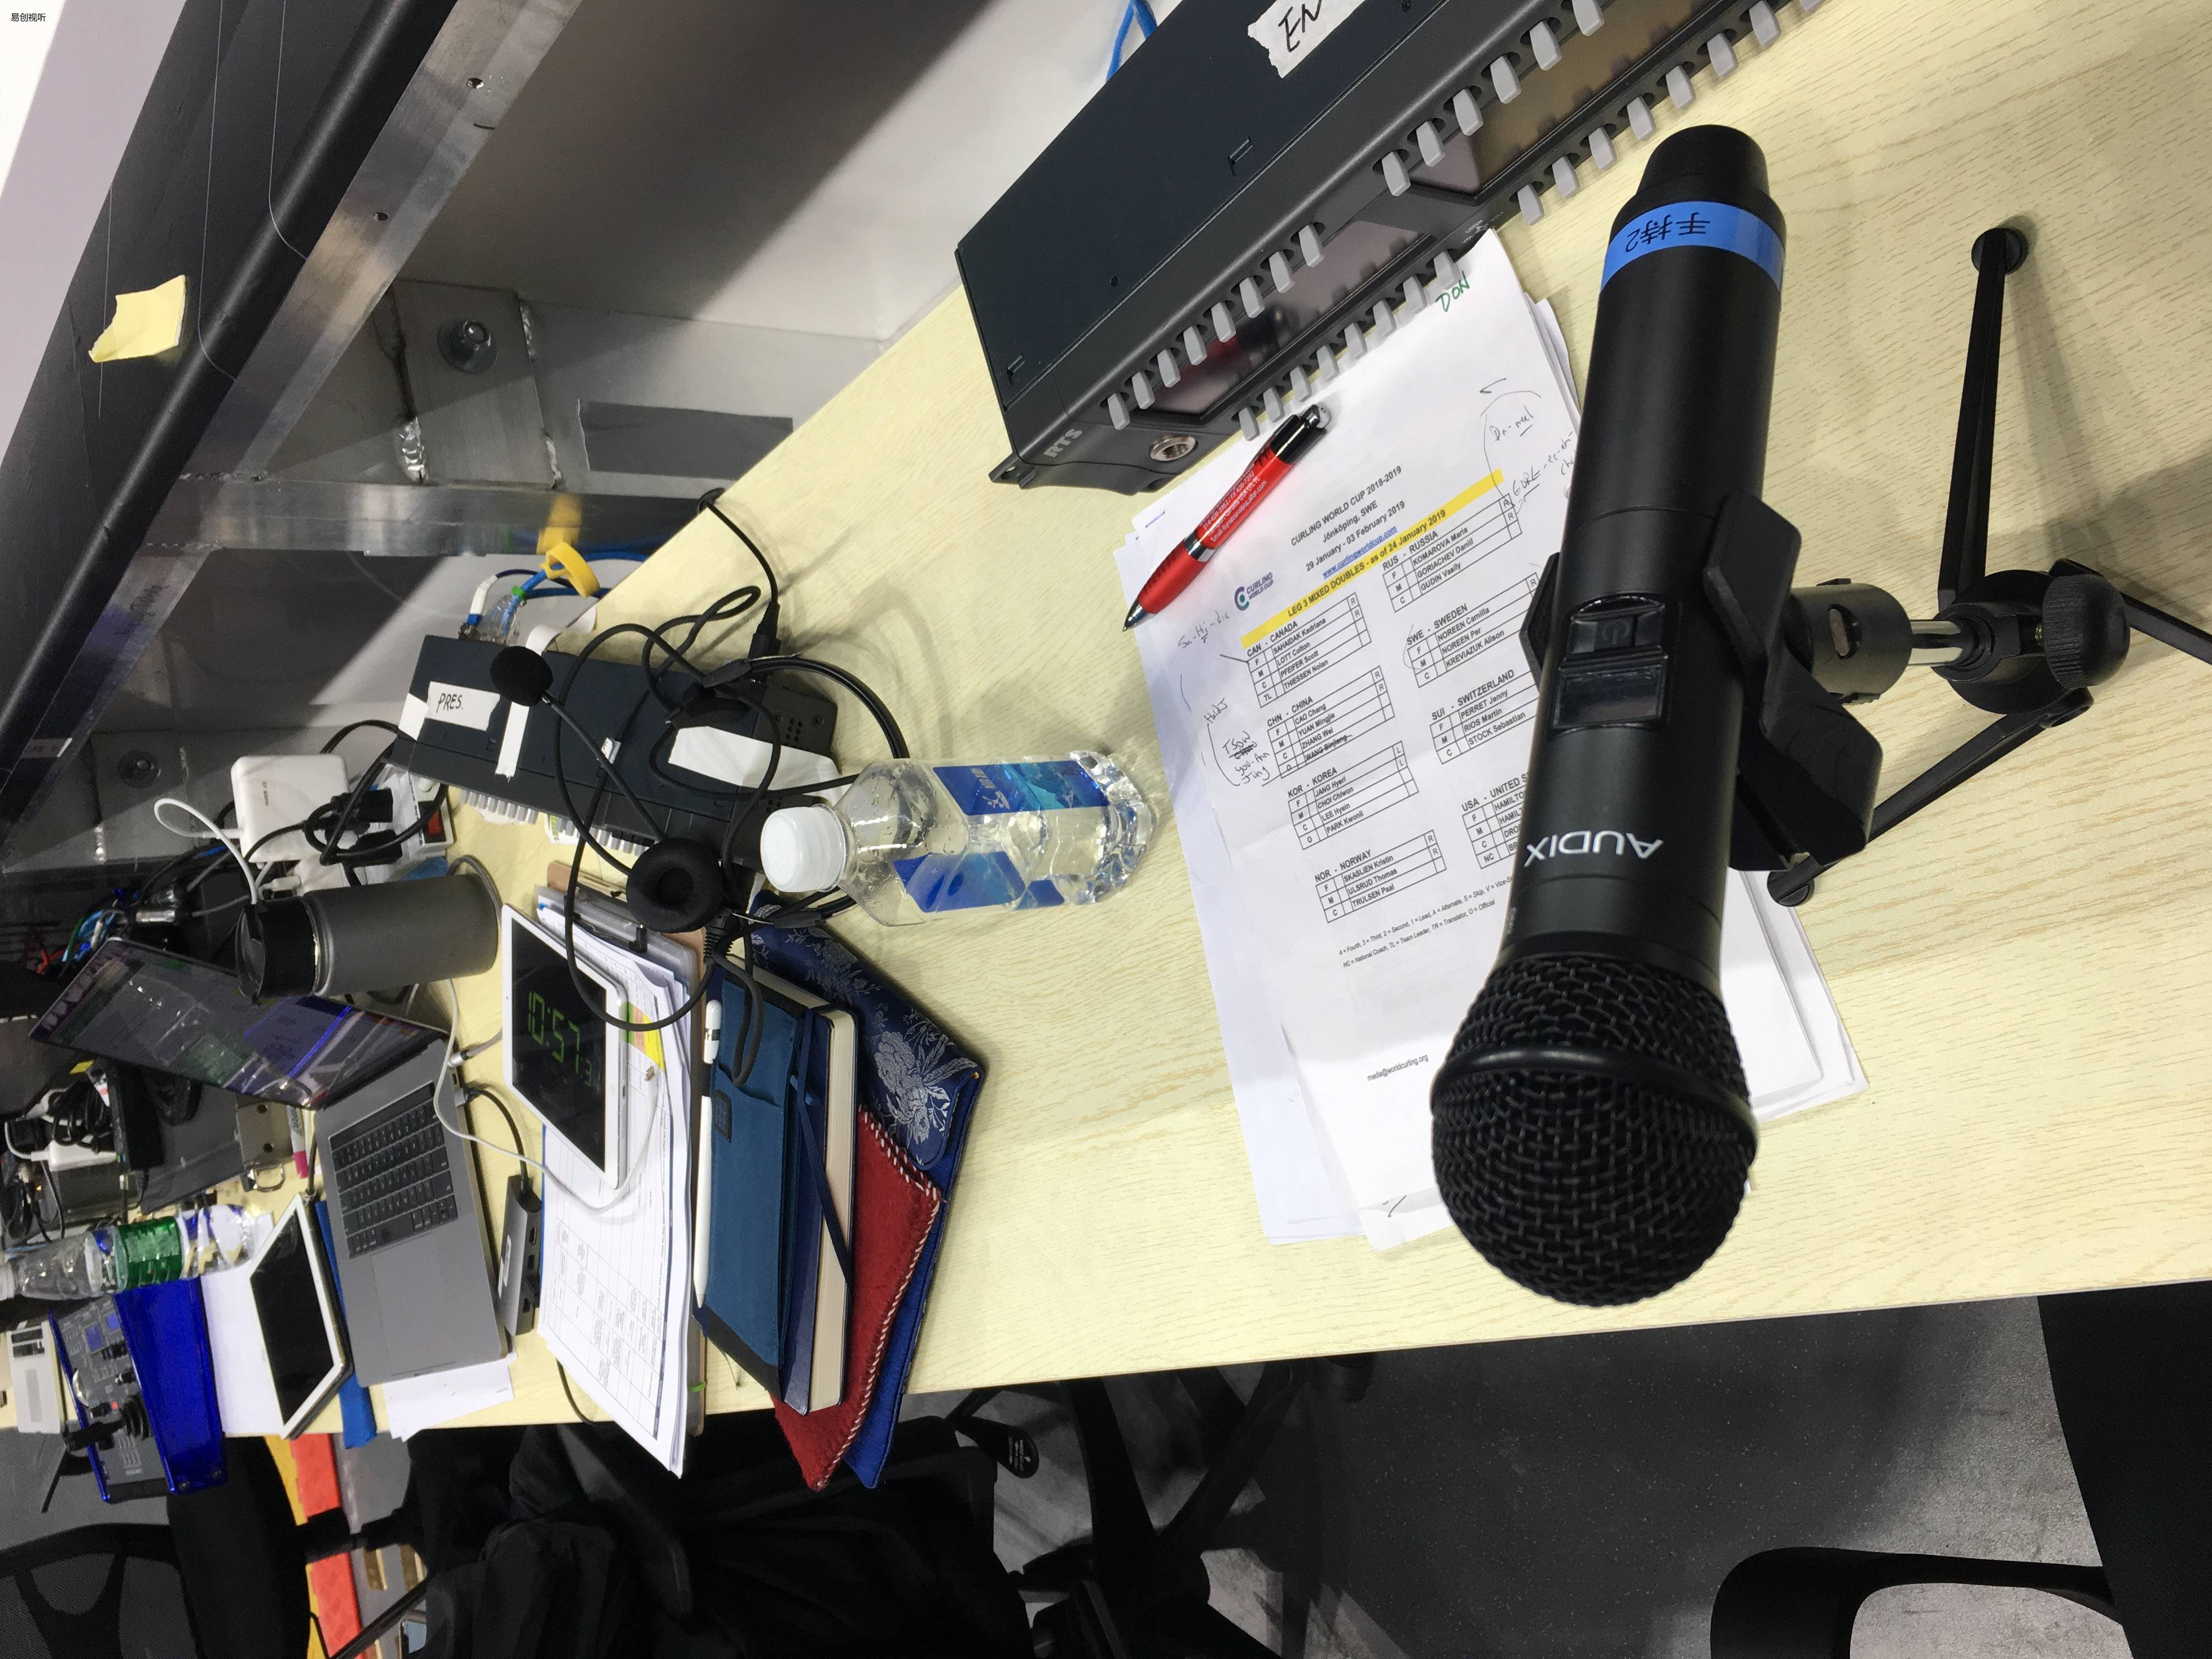 Audix无线话筒冰壶世界杯